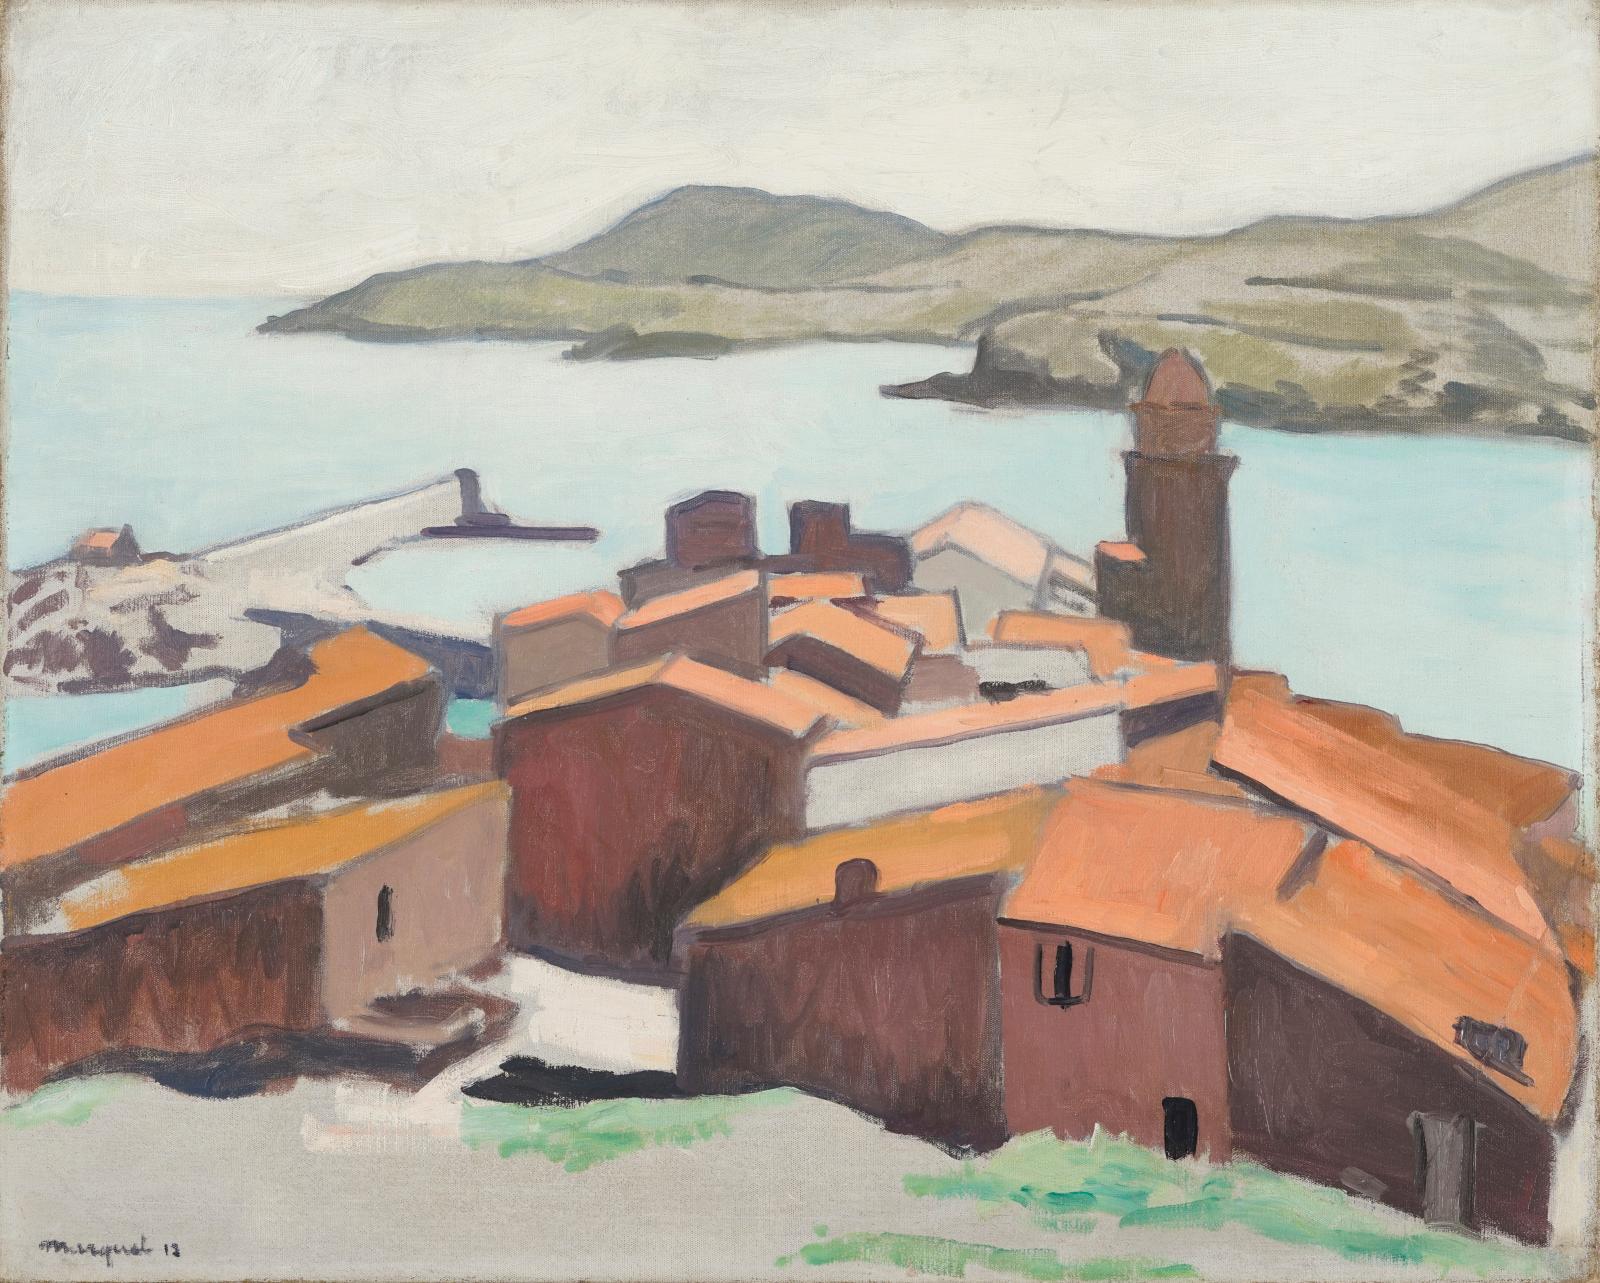 Albert Marquet (1975-1947), Collioure, 1912, oil on canvas, 65 x 61 cm/25.6 x 24 in. Estimate: €70,000/120,000